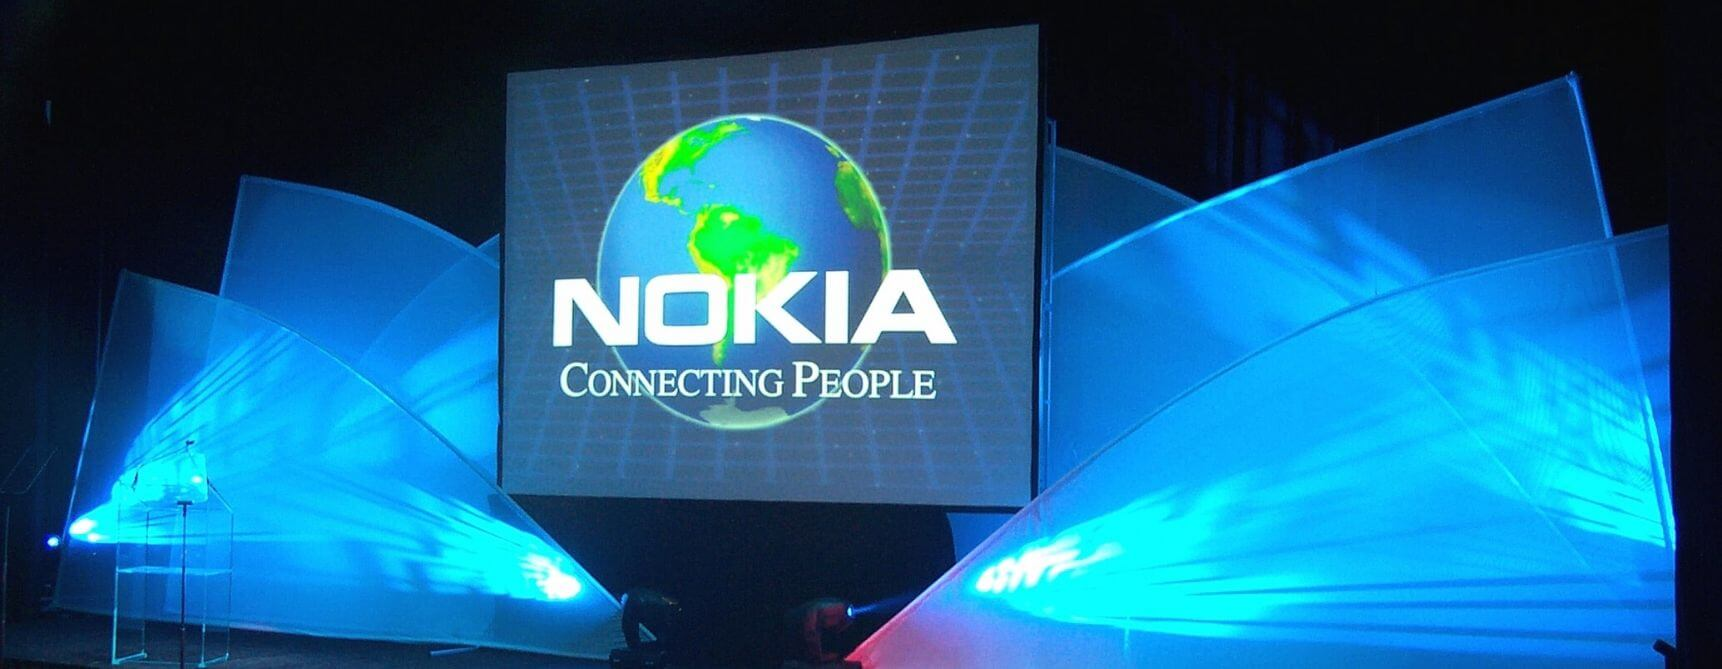 9 Nokia Corporate Event